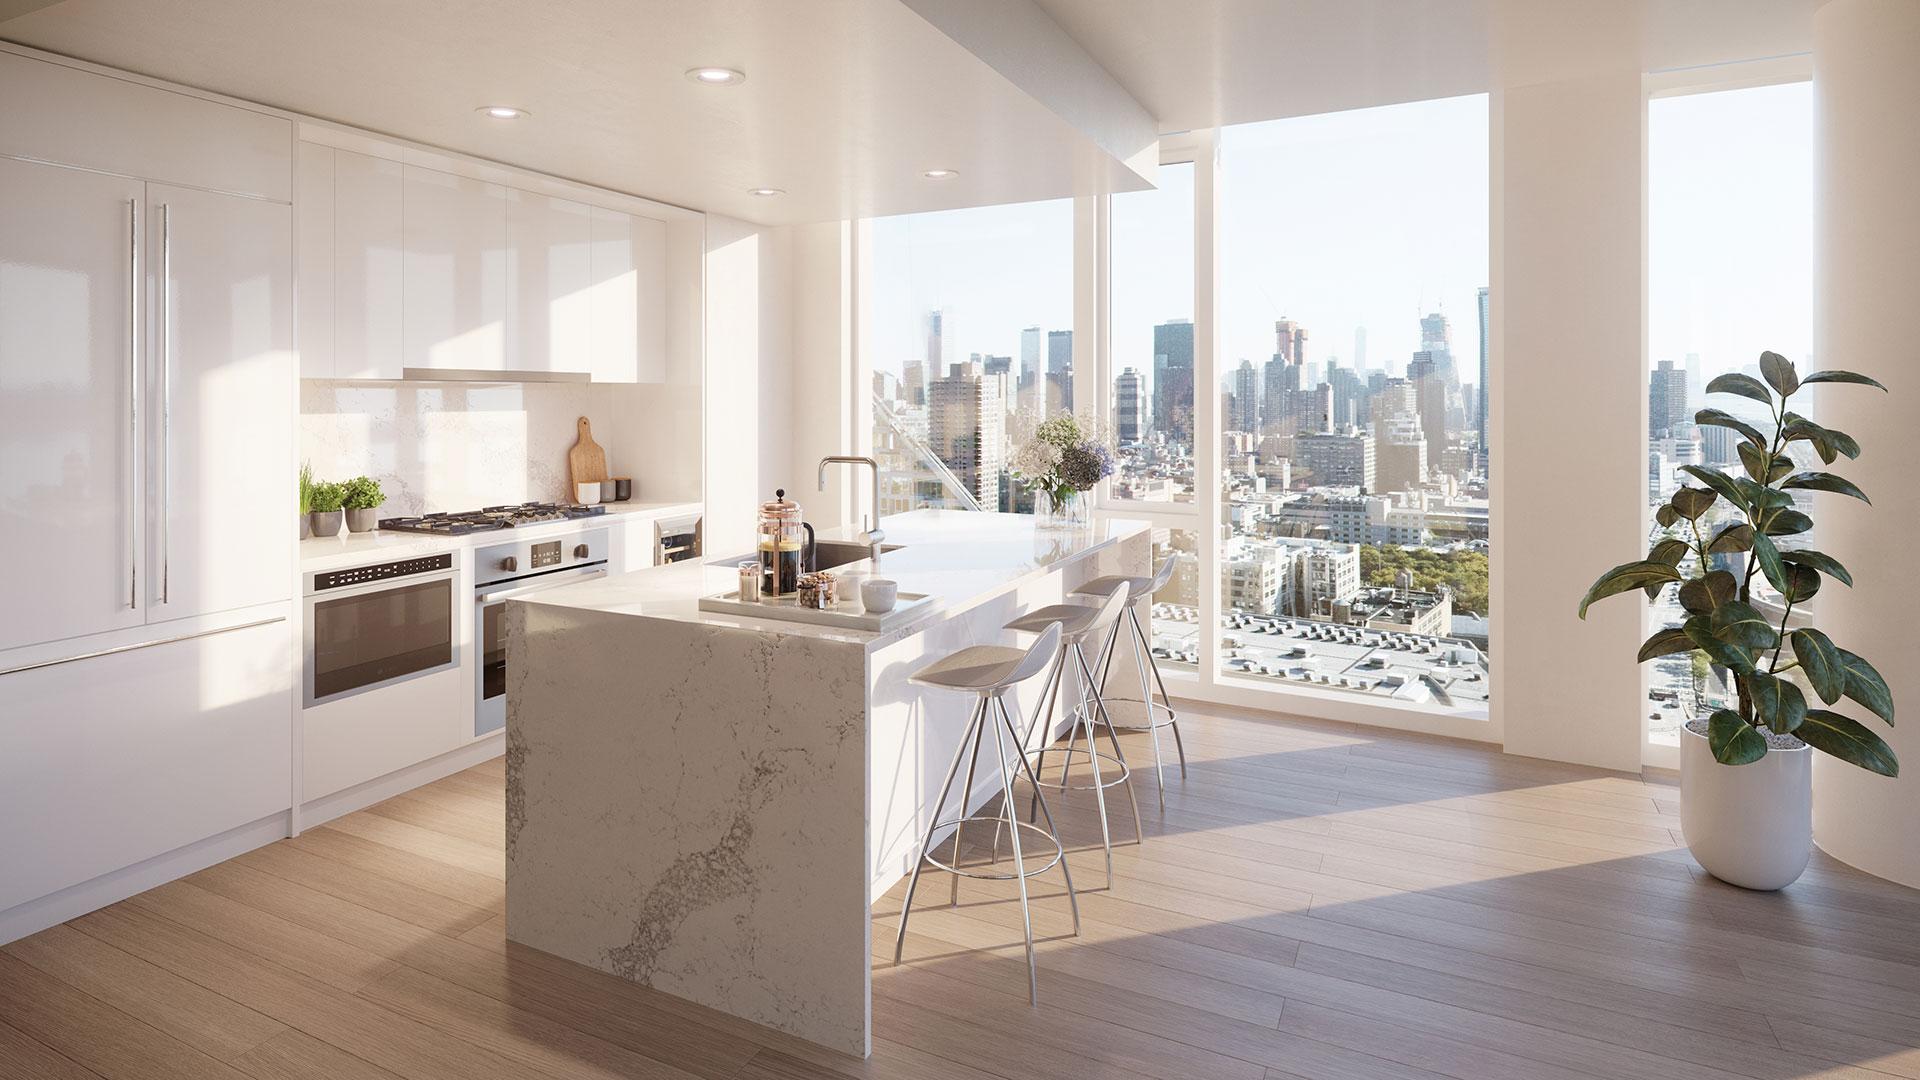 luxury nyc apartment kitchen